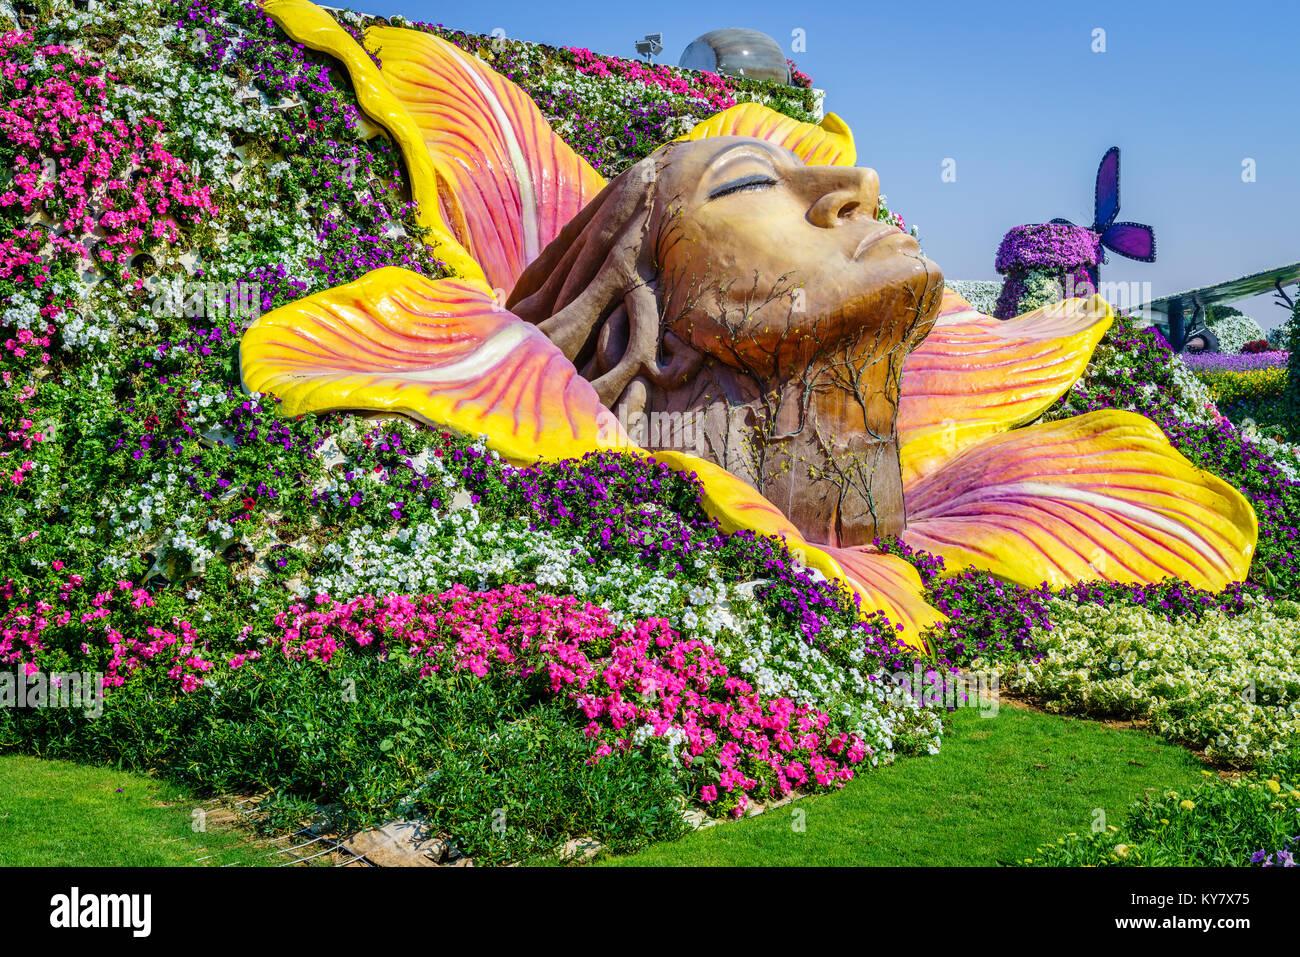 Image Result For Flower Garden Dubai Ticket Price